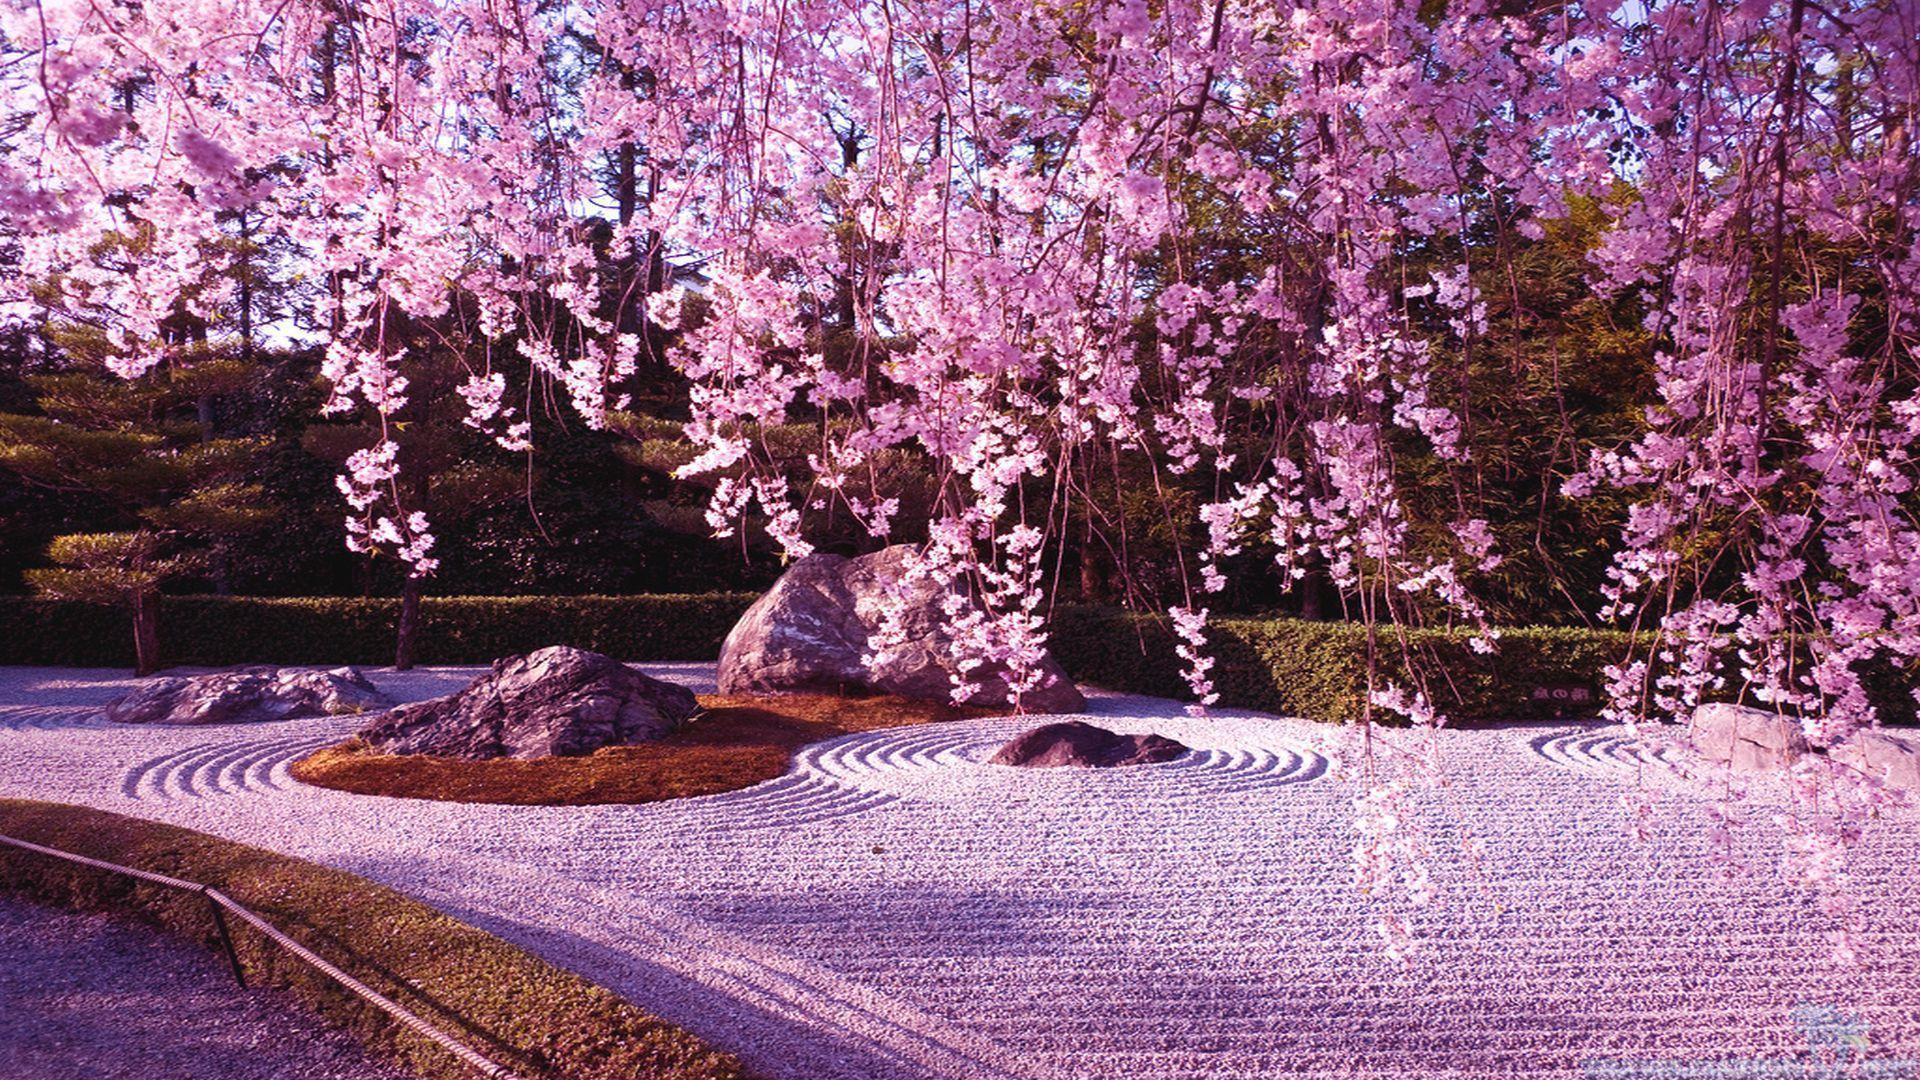 Cherry Blossom Wallpaper Desktop 6536 Full HD